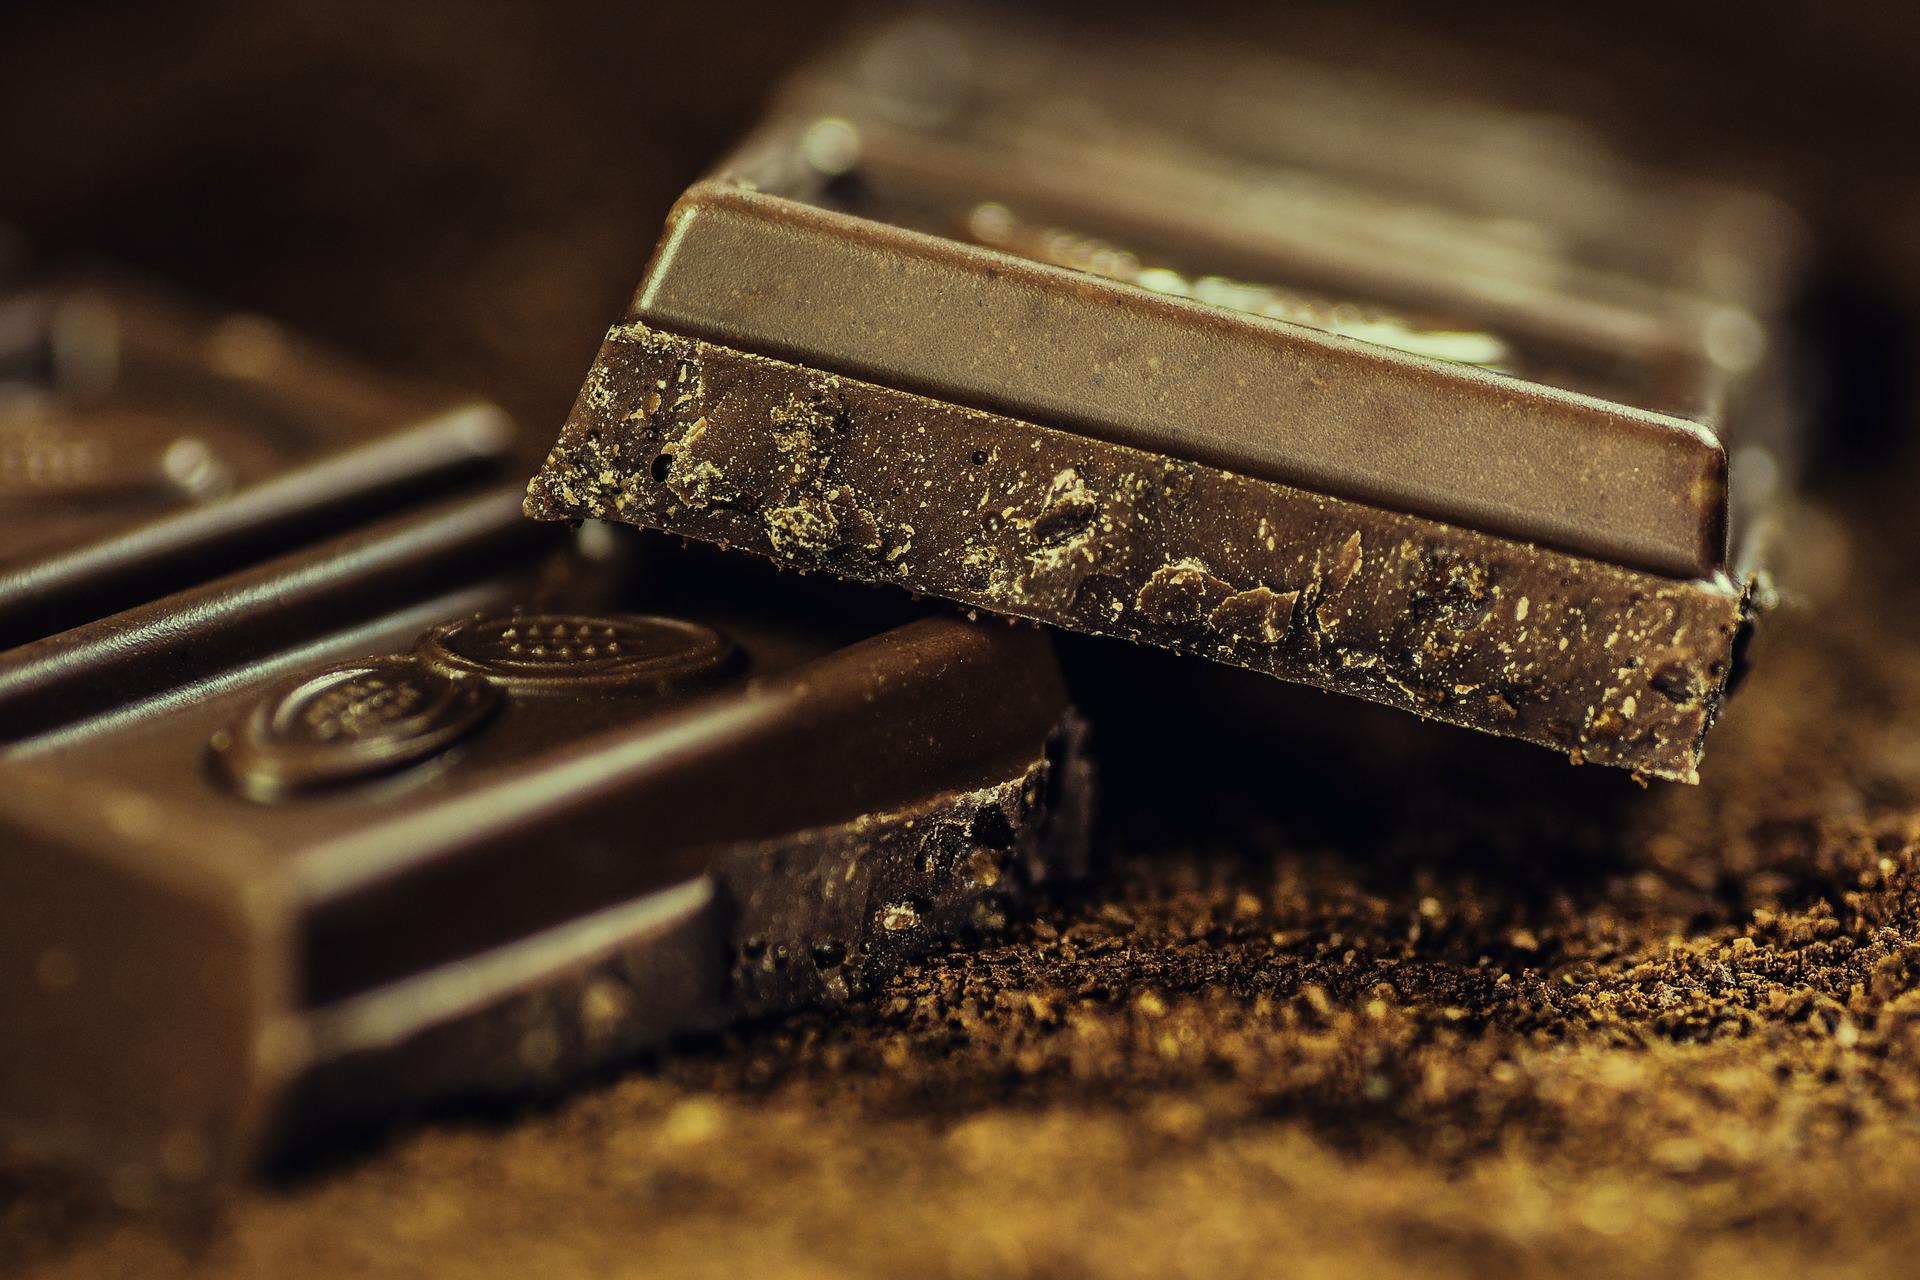 chocolate-183543_1920.jpg